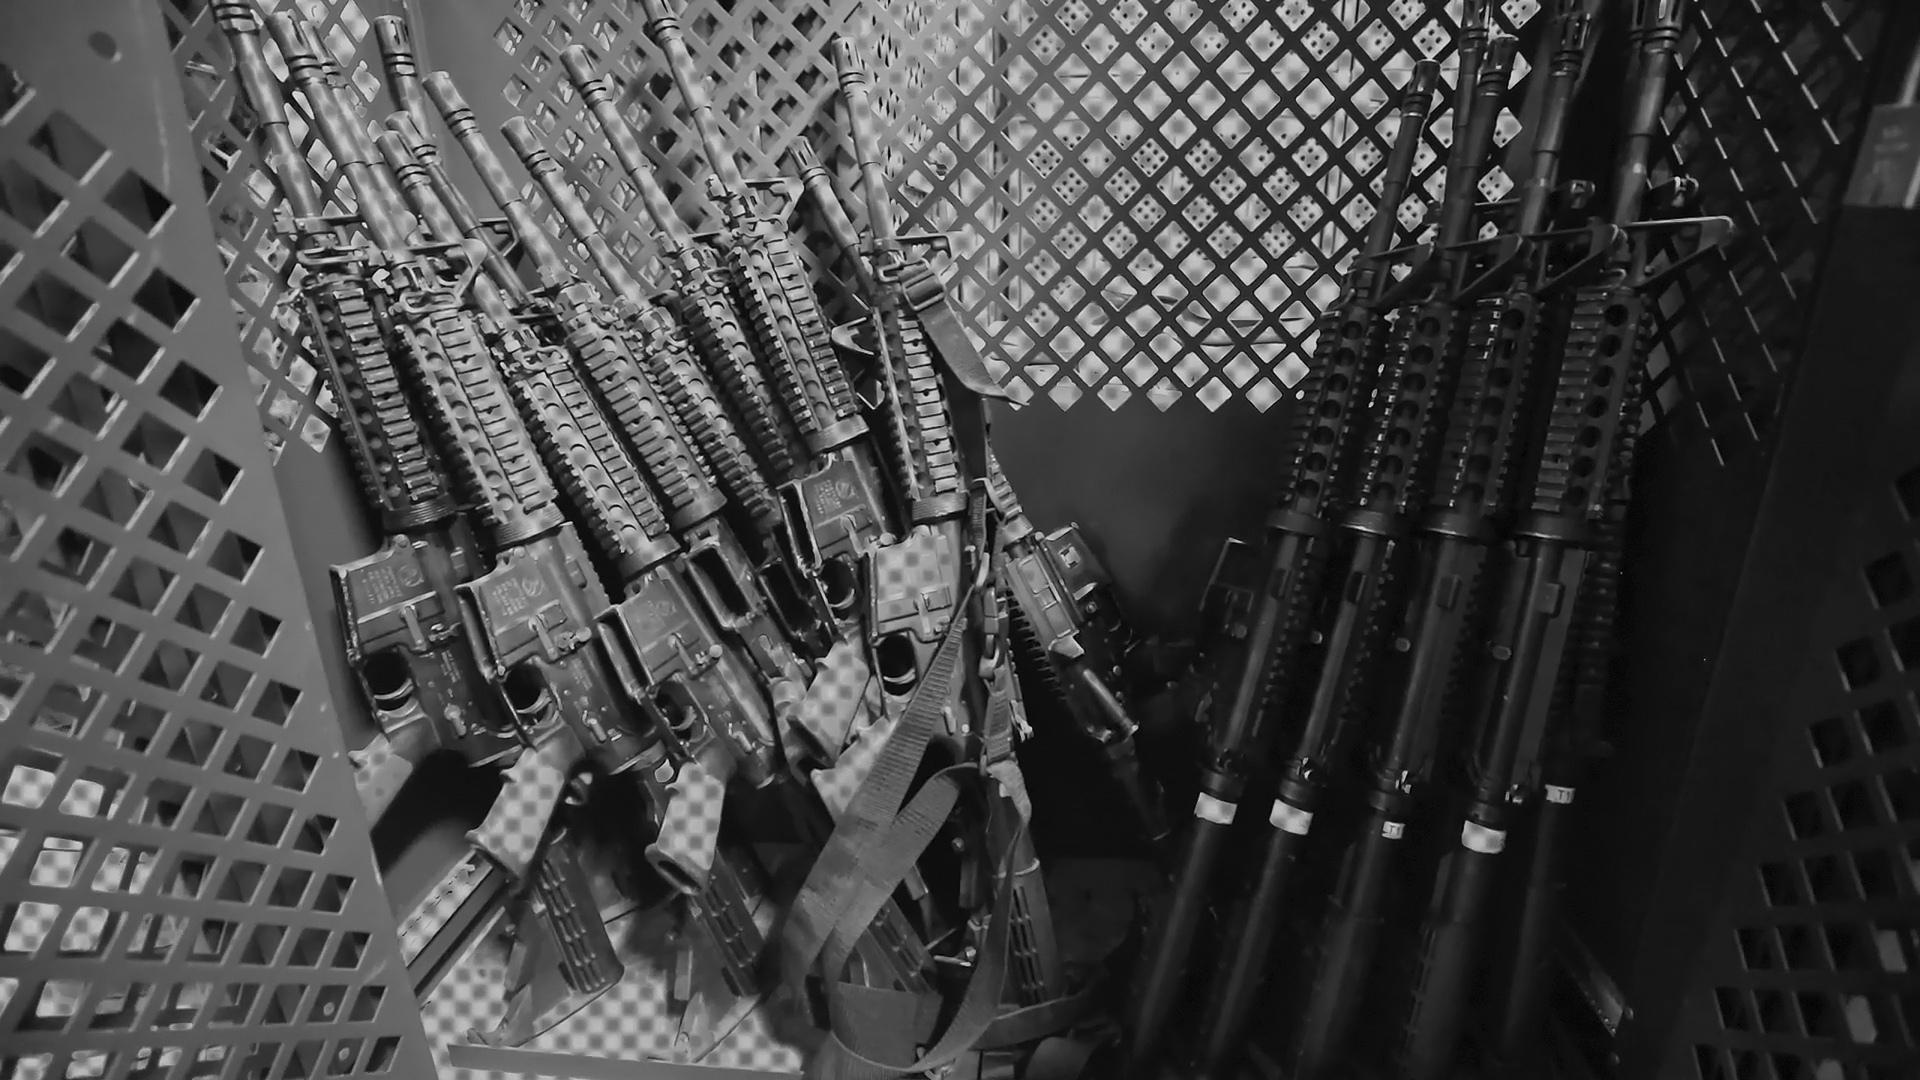 Some Stolen U.S. Military Guns Used in Violent Crimes